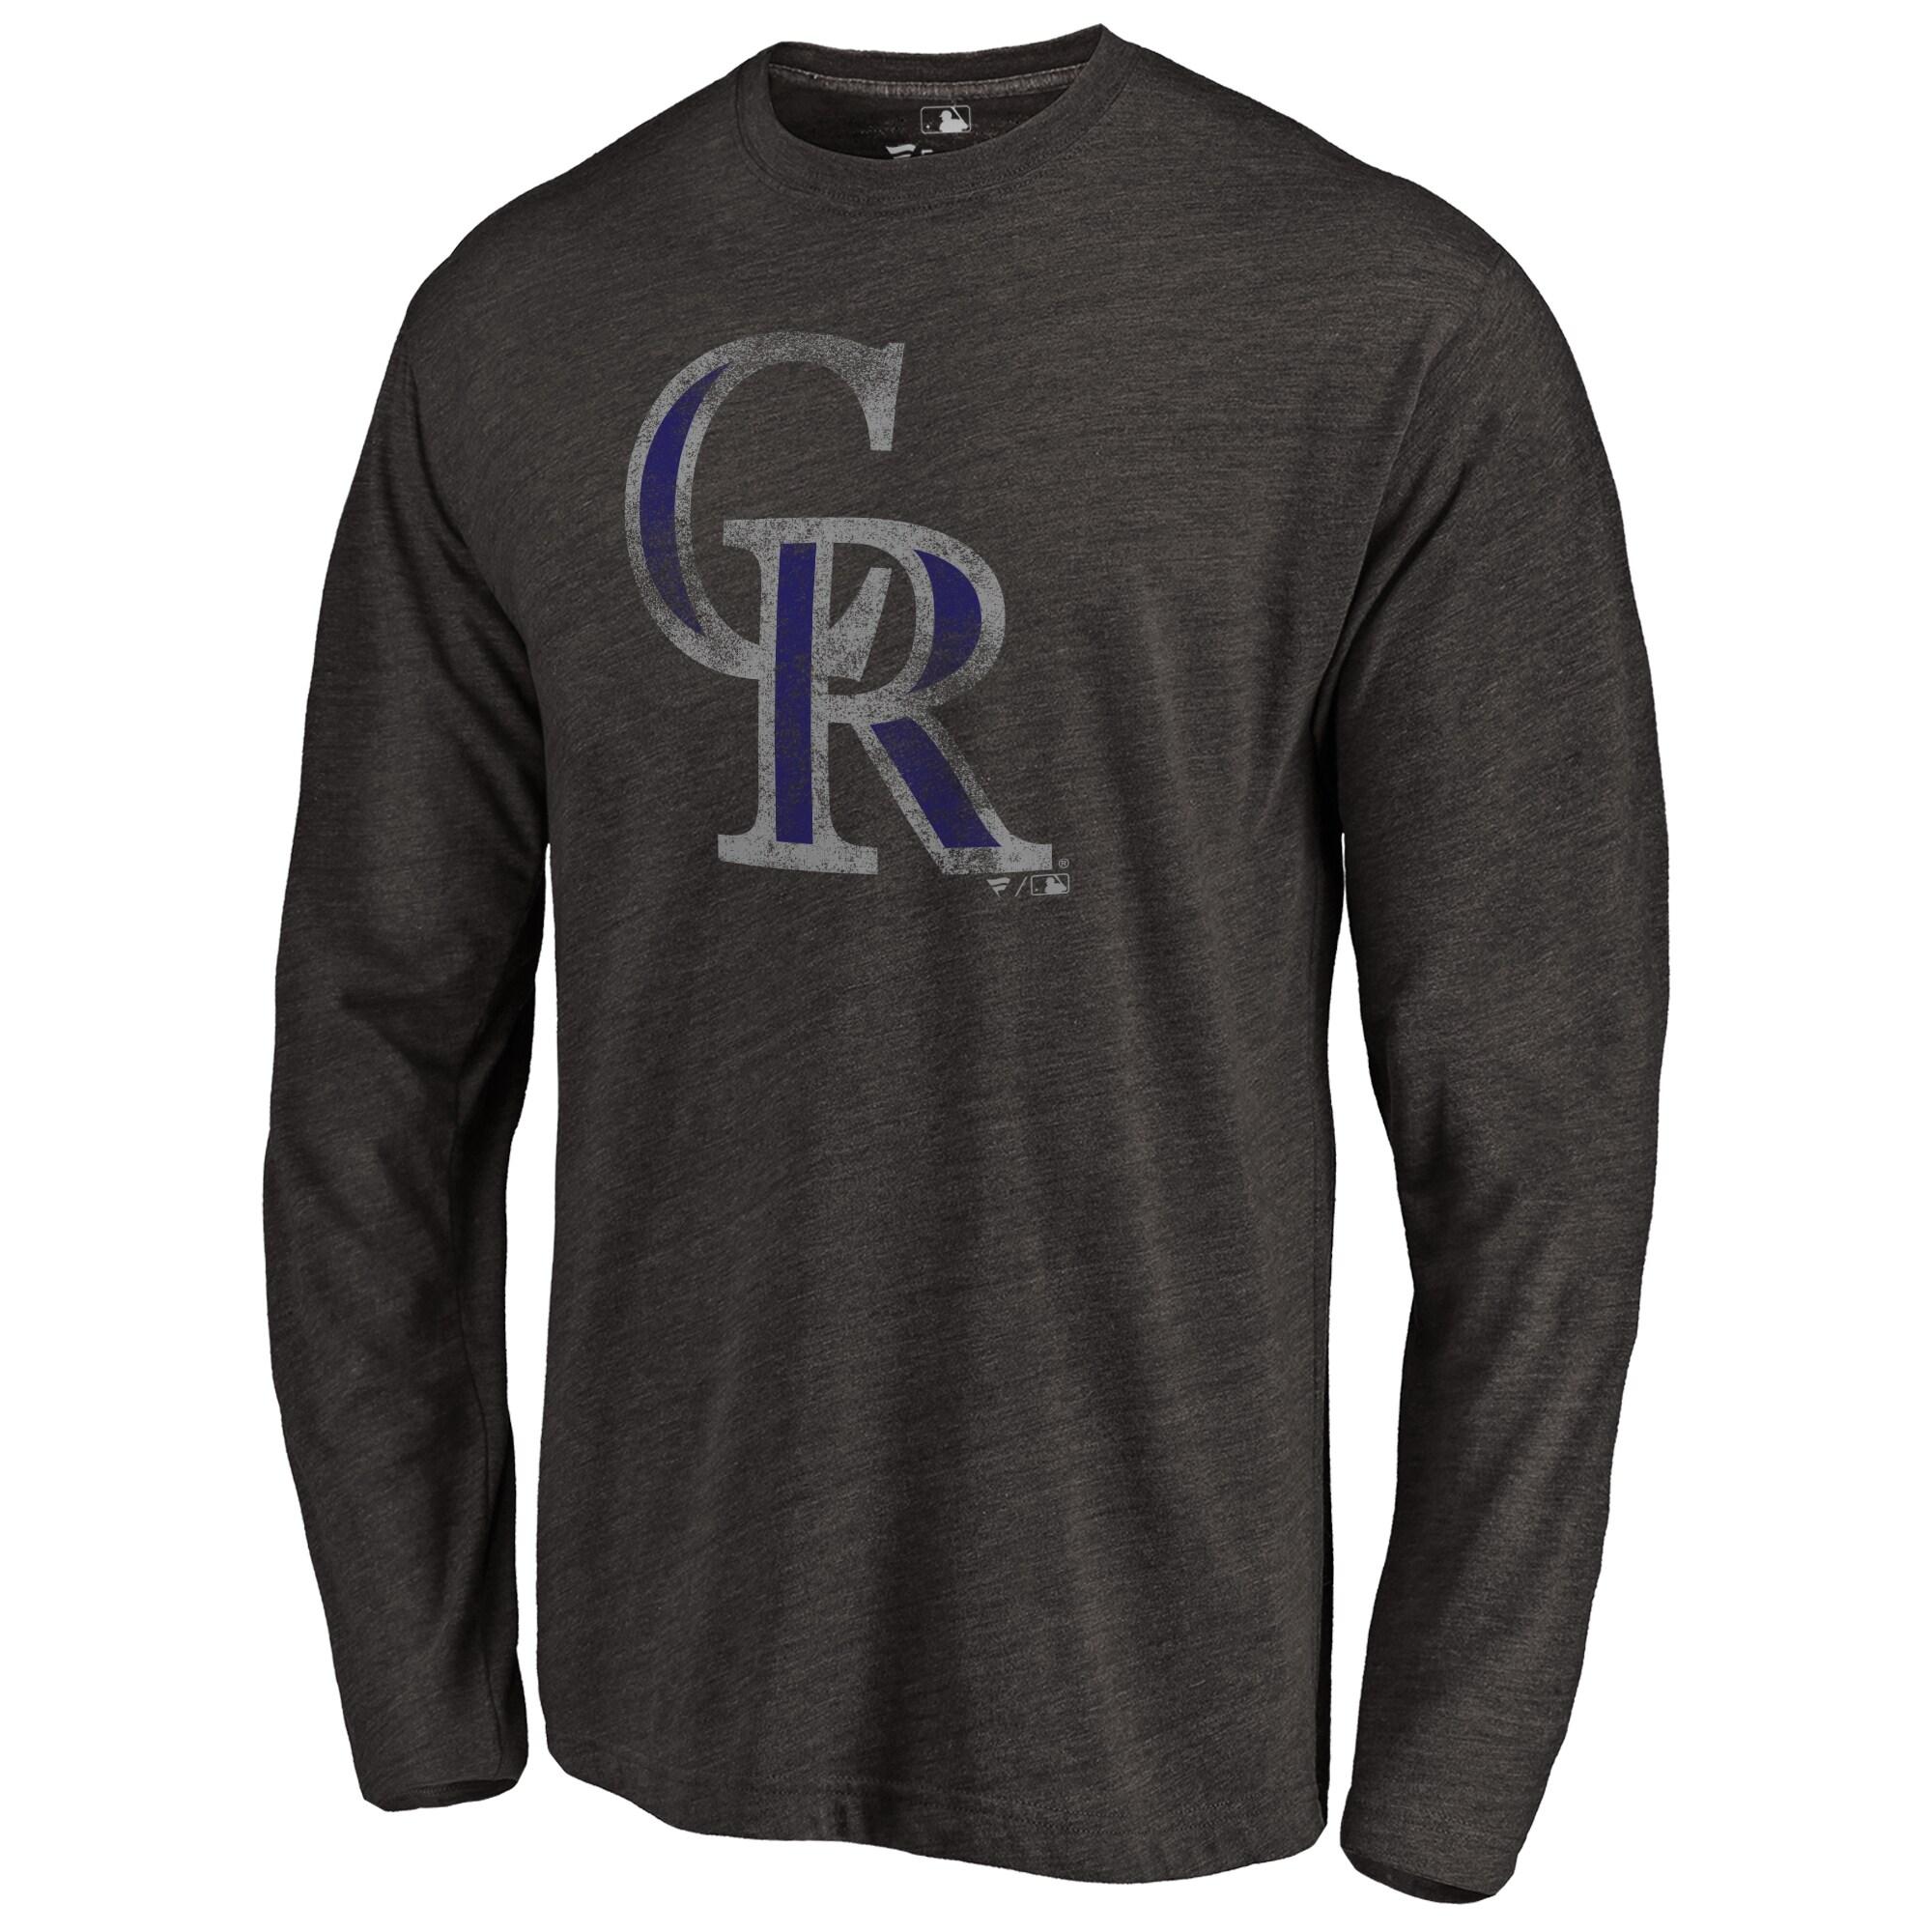 Colorado Rockies Distressed Team Long Sleeve Tri-Blend T-shirt - Black